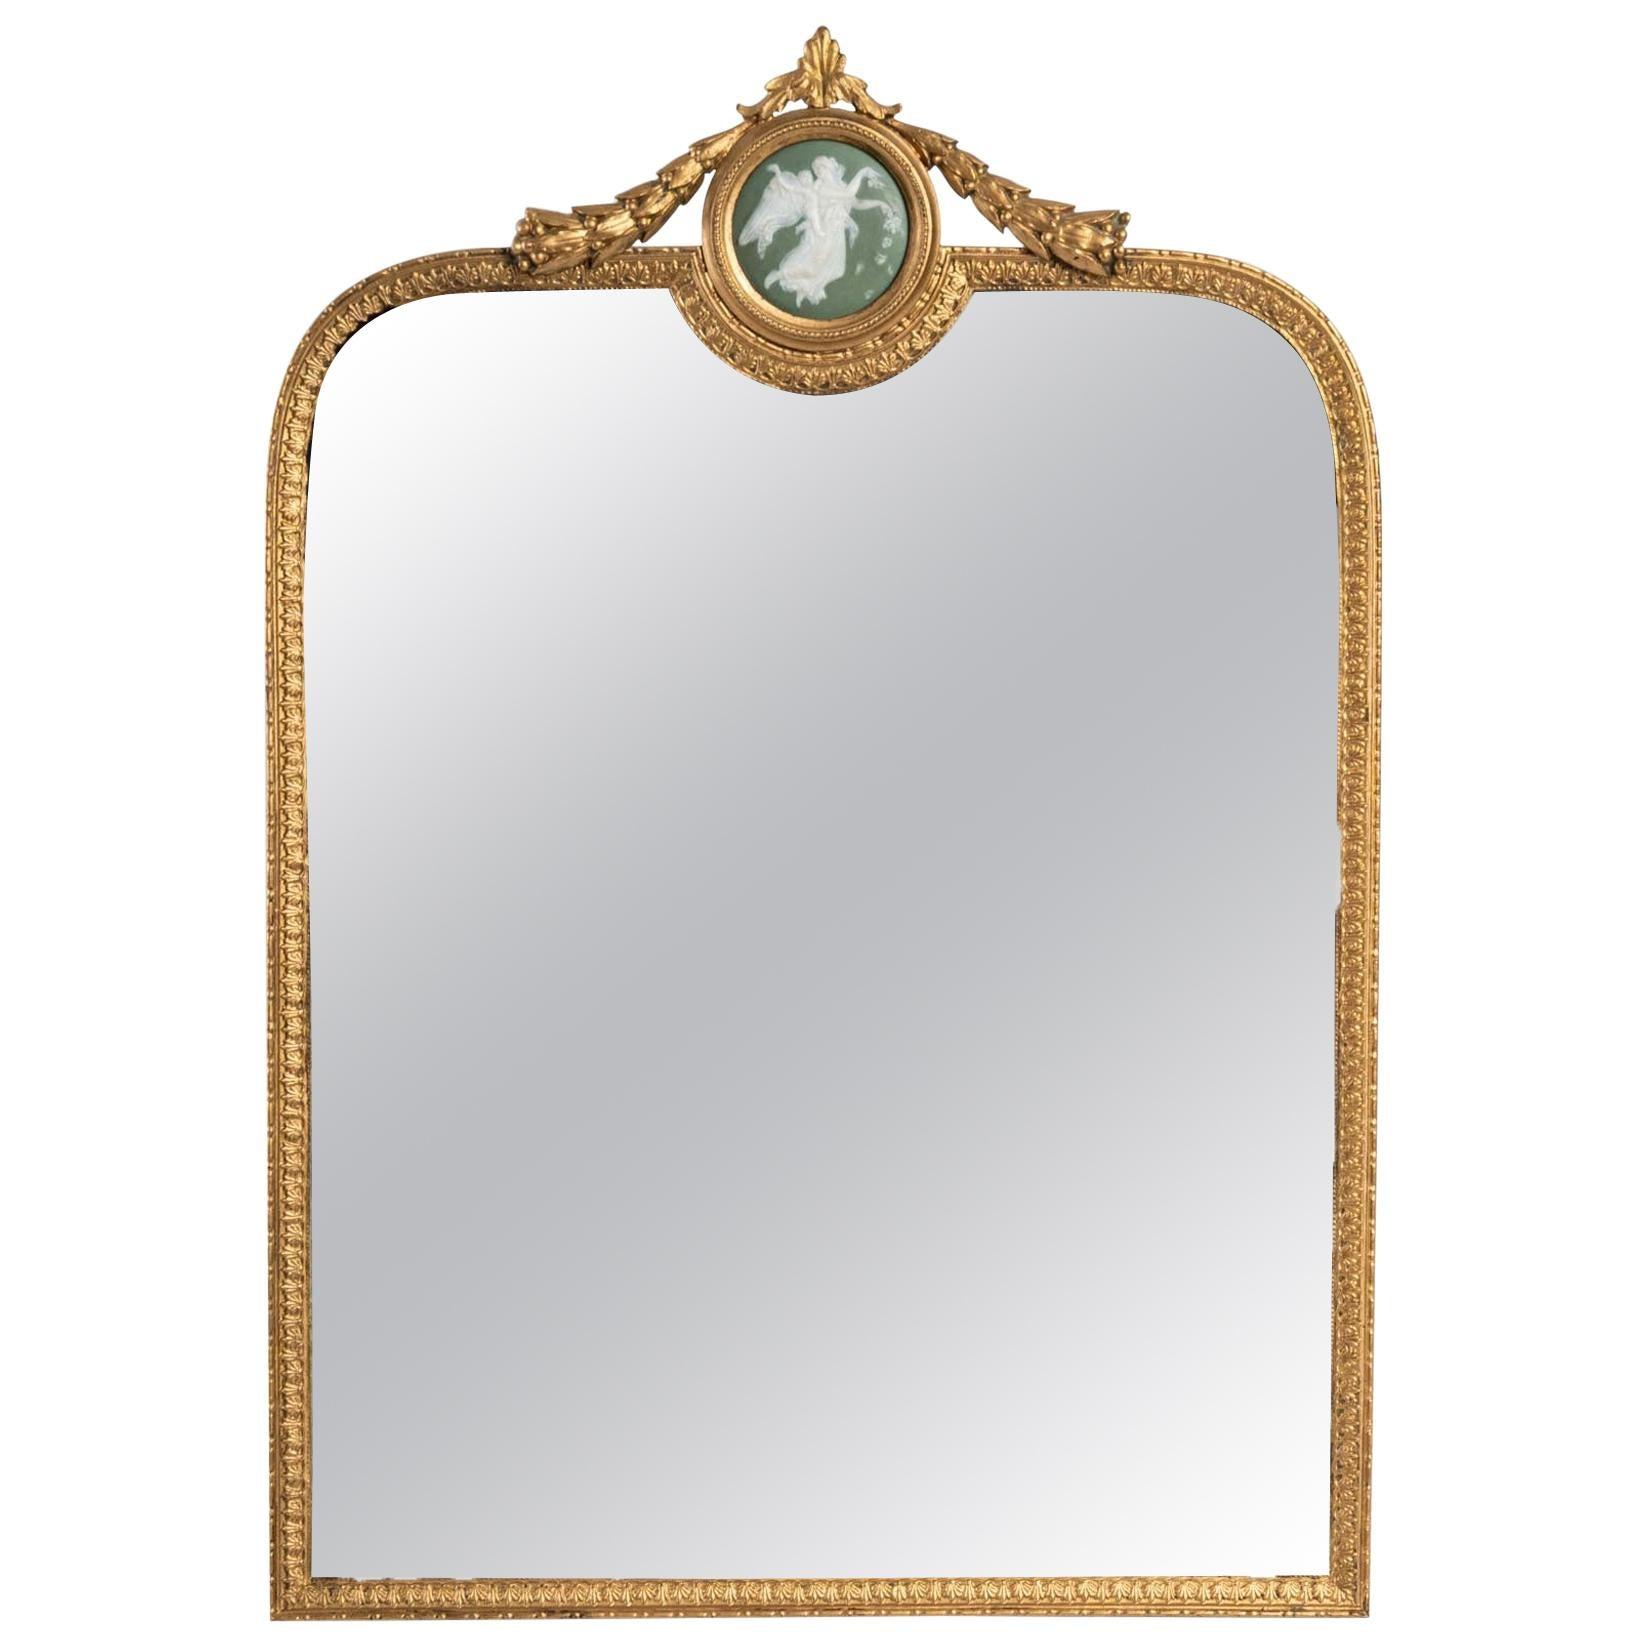 Charming Table Mirror, 19th Century